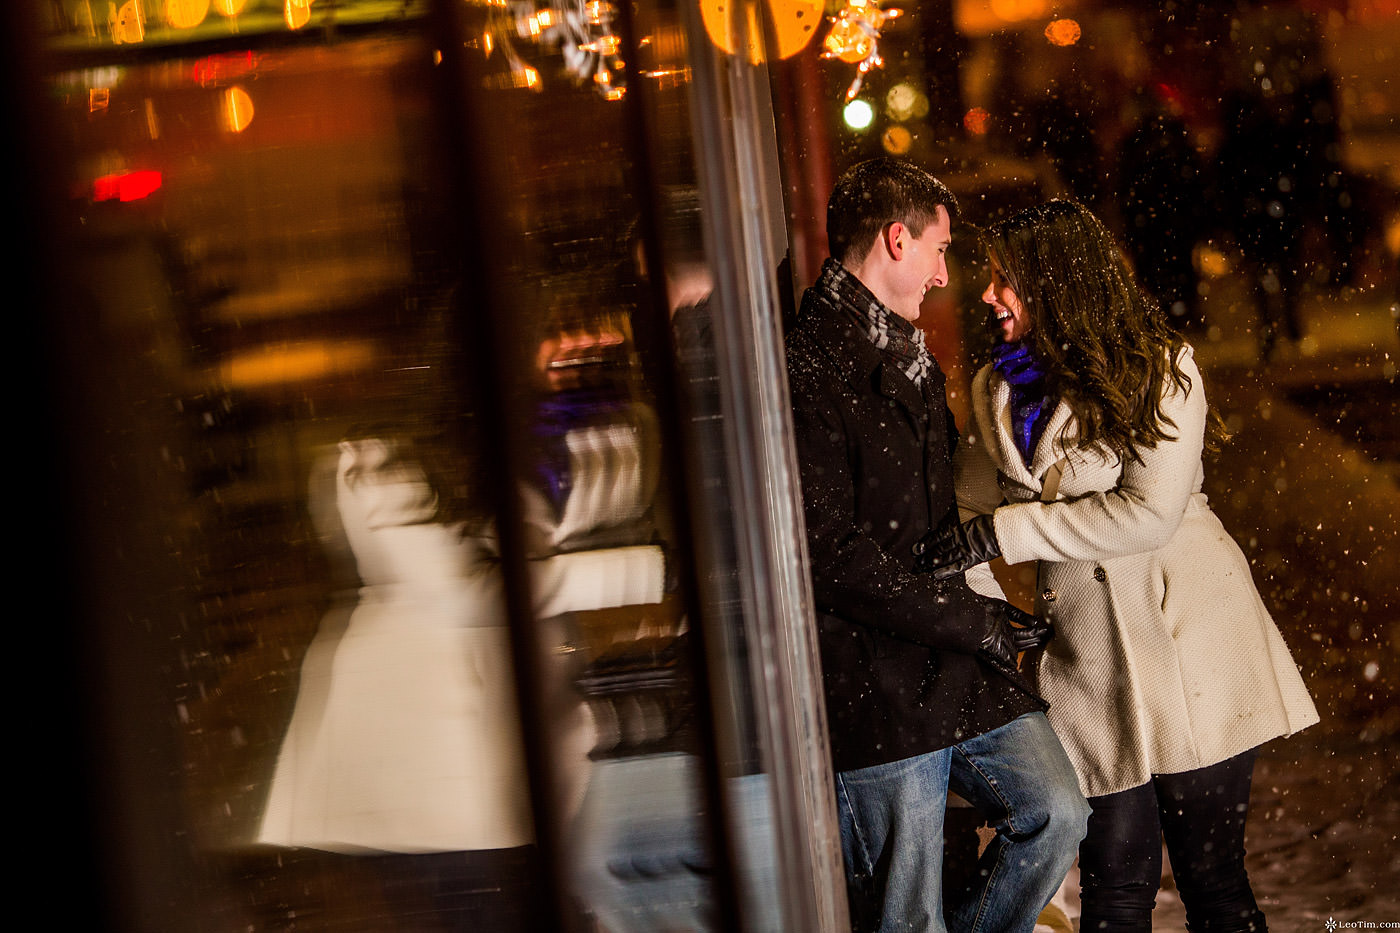 nyc-winter-engagement-photos-04.jpg